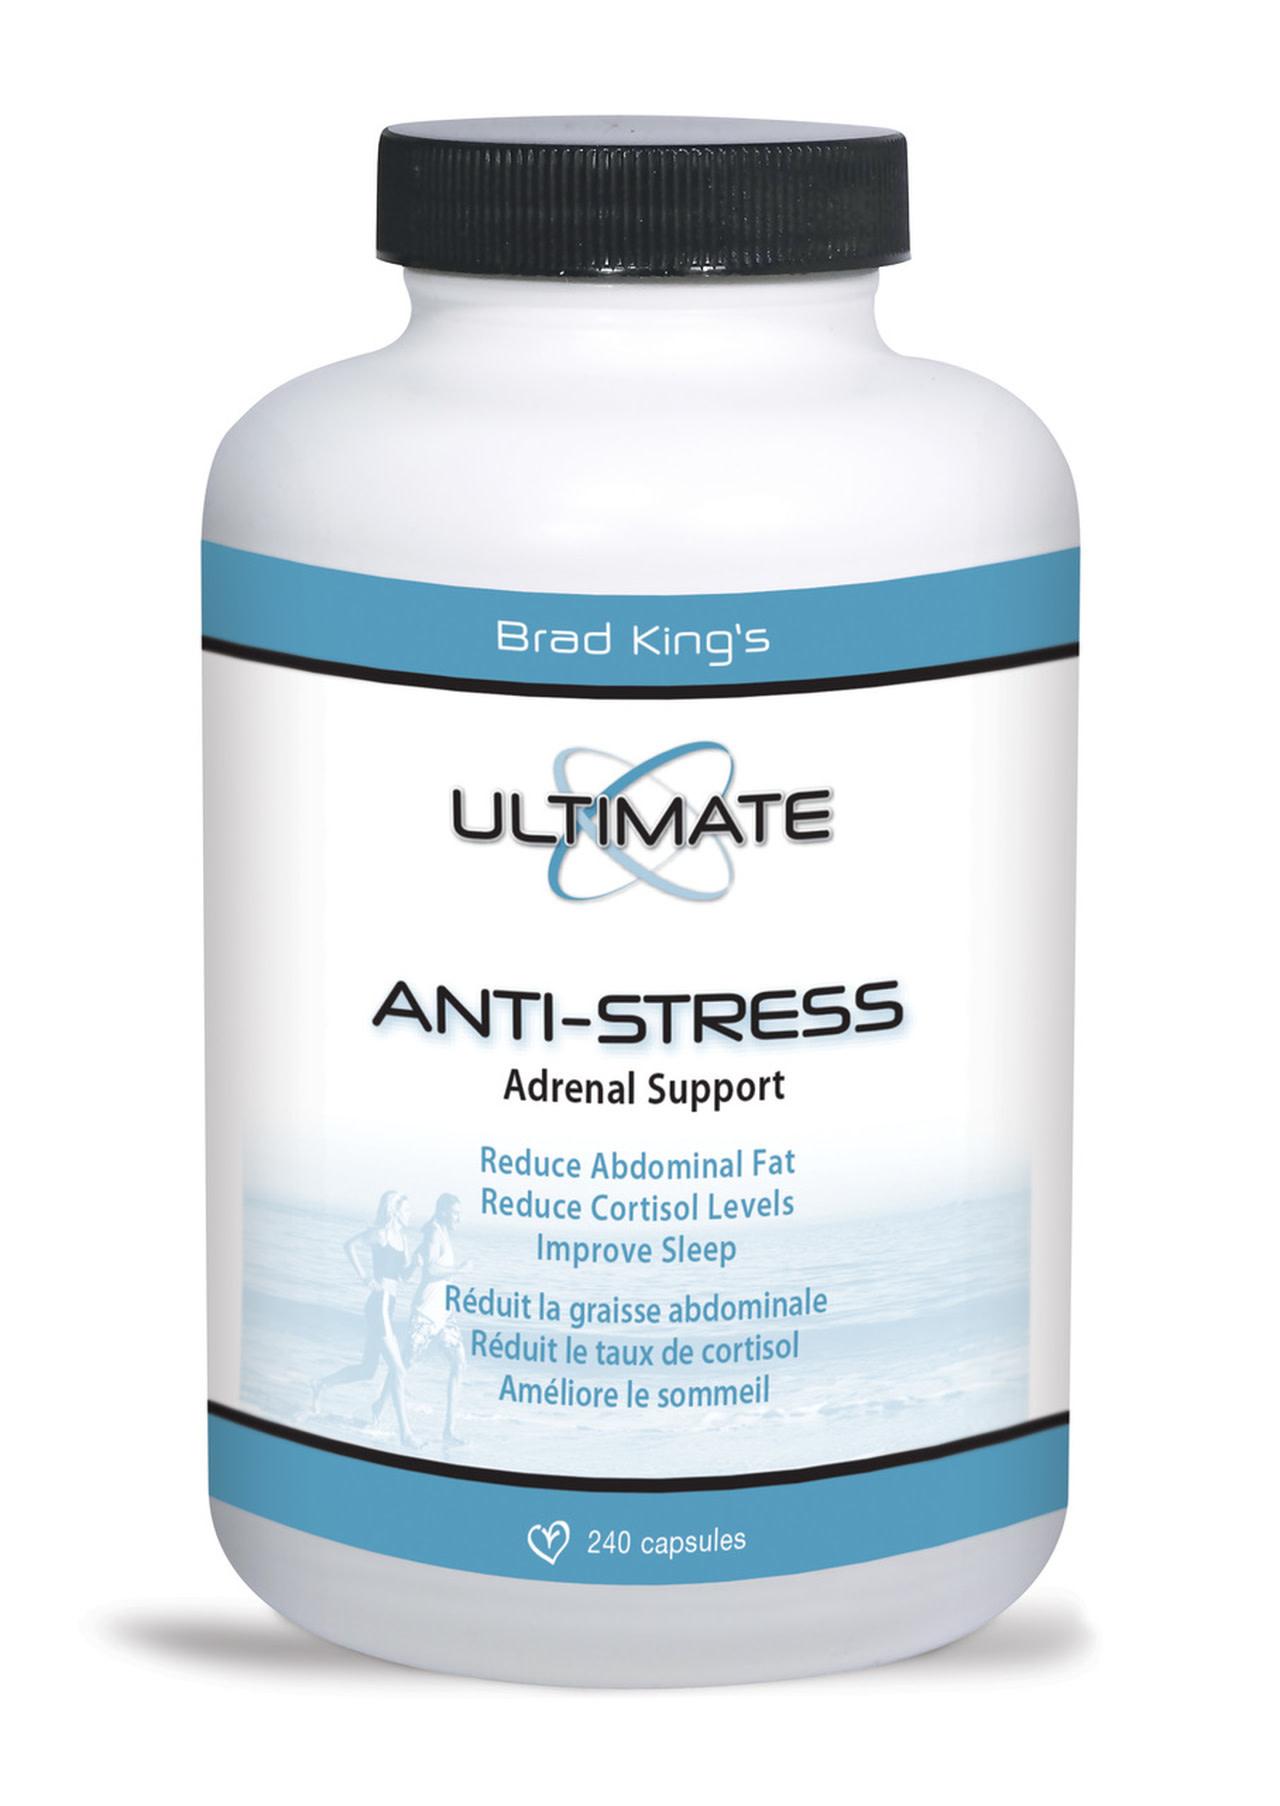 Ultimate Ultimate - Anti-Stress - 240 Caps